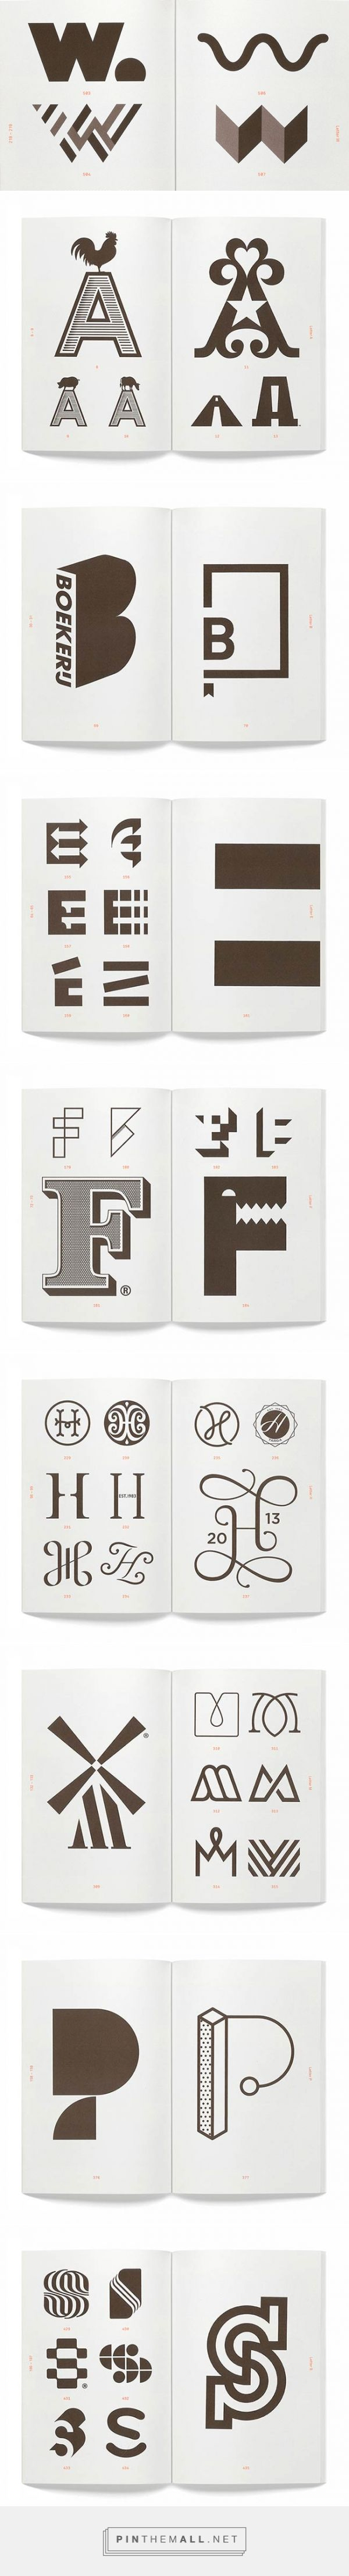 top 25 best alphabet logo ideas on pinterest alphabet tattoo alphabet logo from counter print logo design love created via https